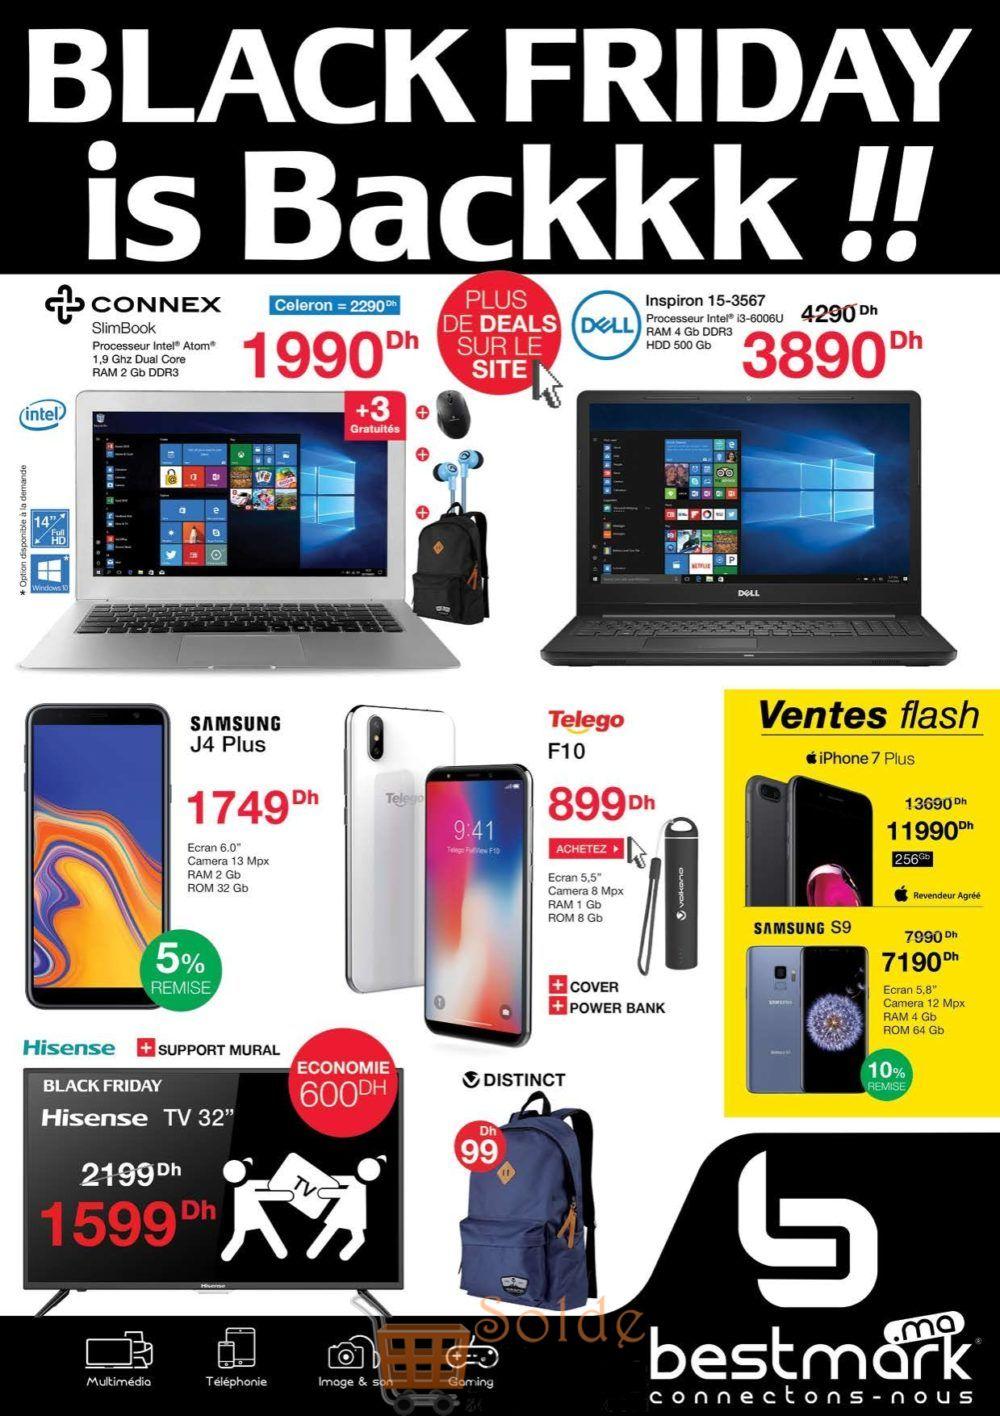 Catalogue Bestmark Black Friday is Back